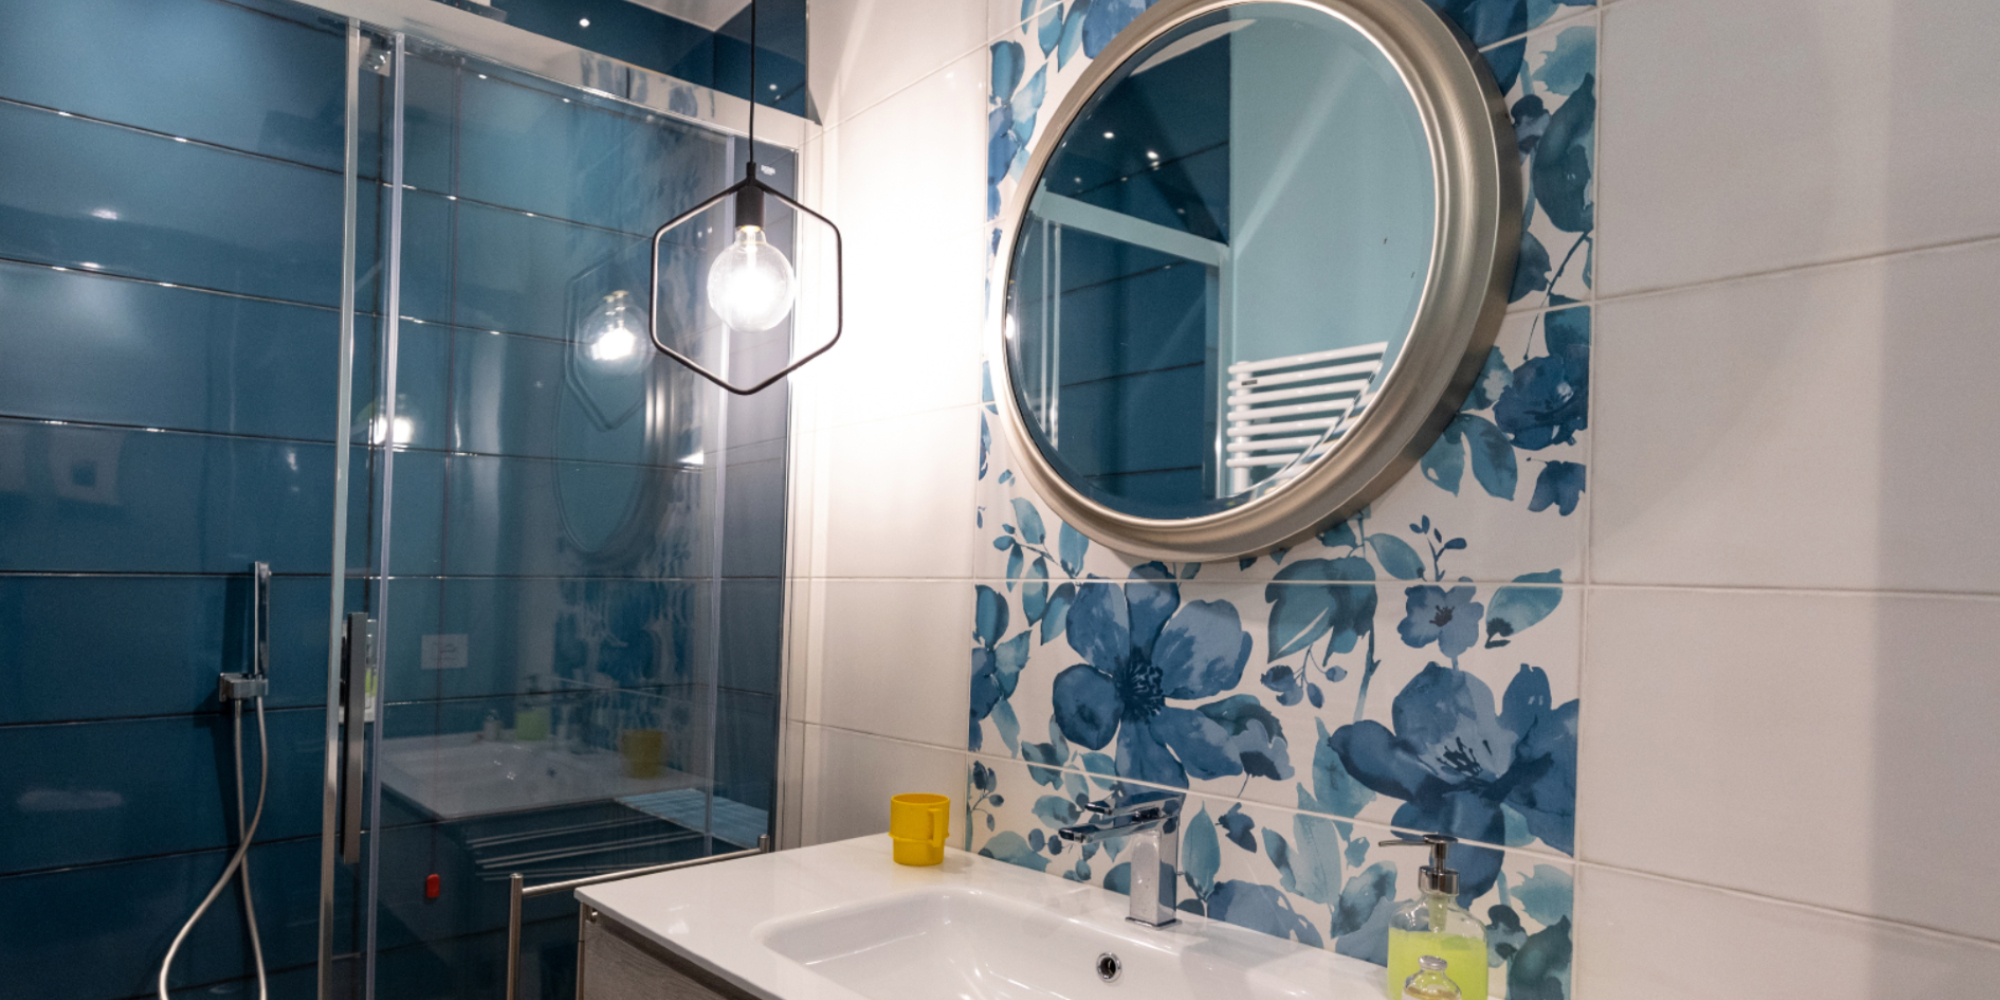 Design Trends 2020 wallpaper and tile in bathrooms